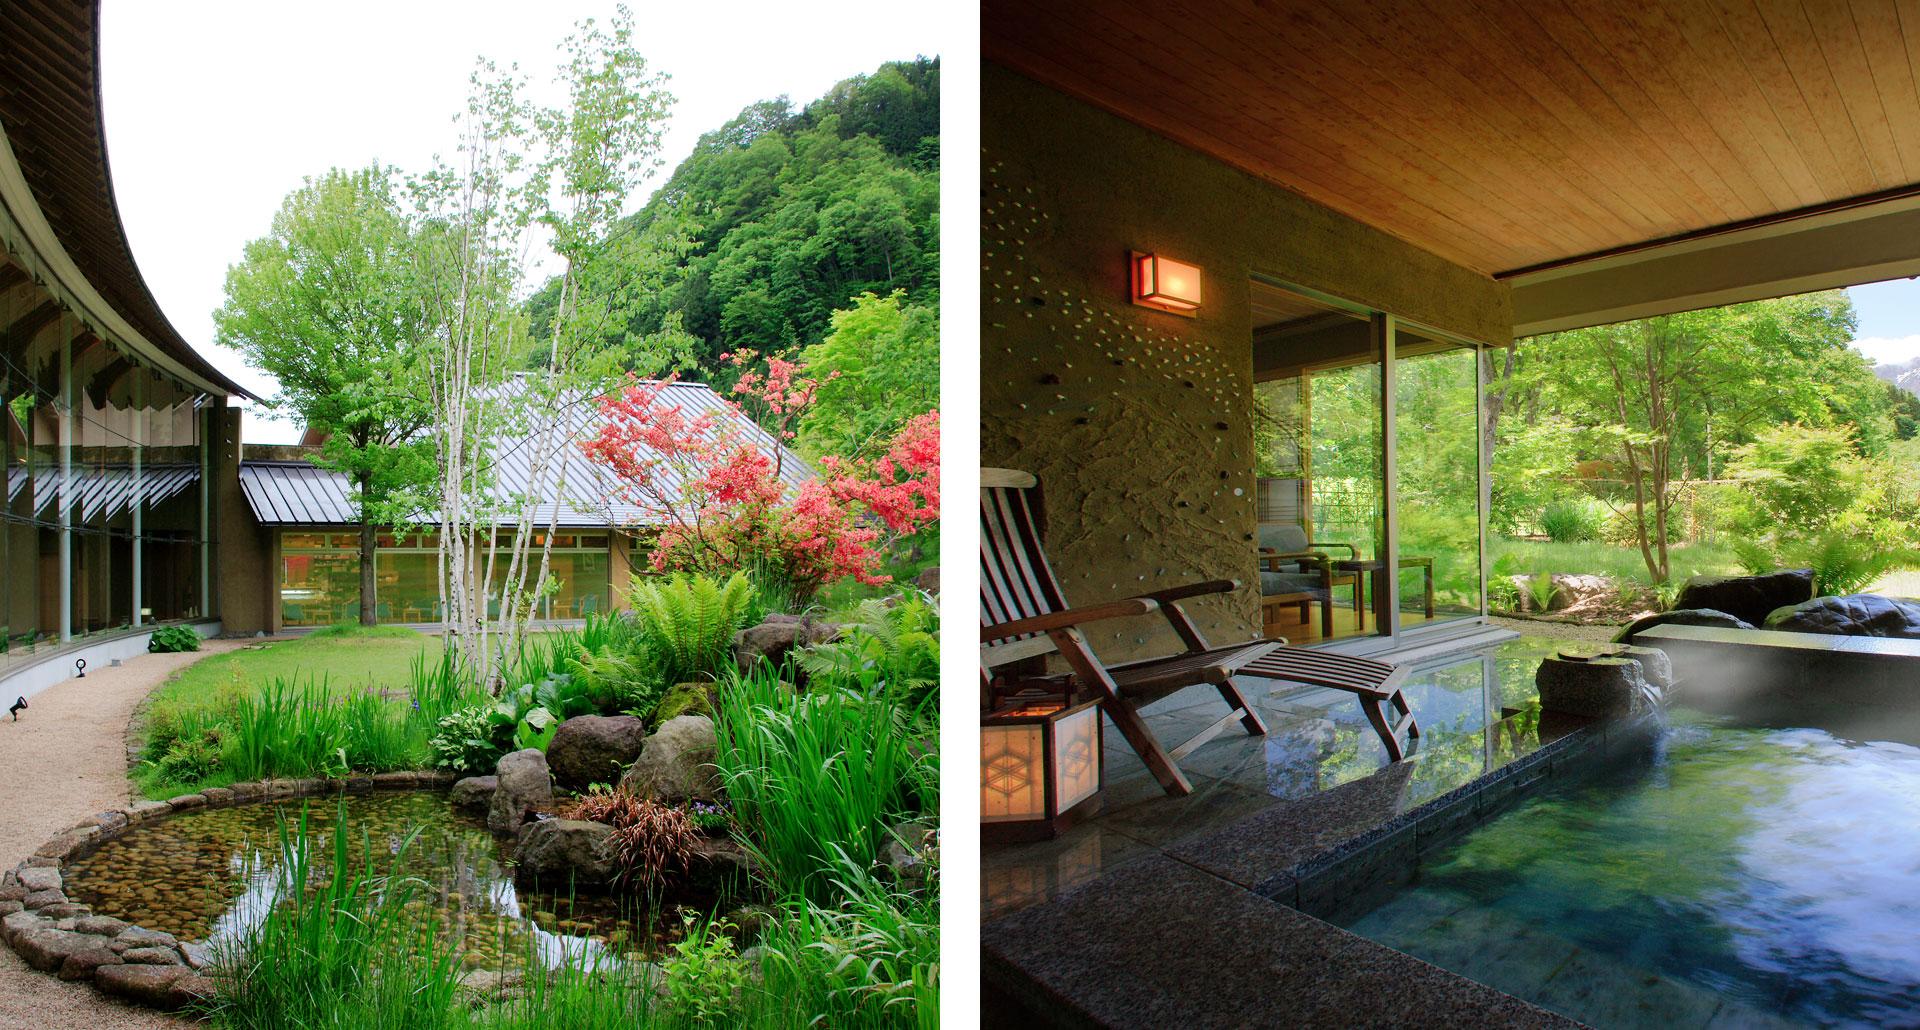 Bettei Senjyuan - boutique hotel in Tanigawa-Onsen